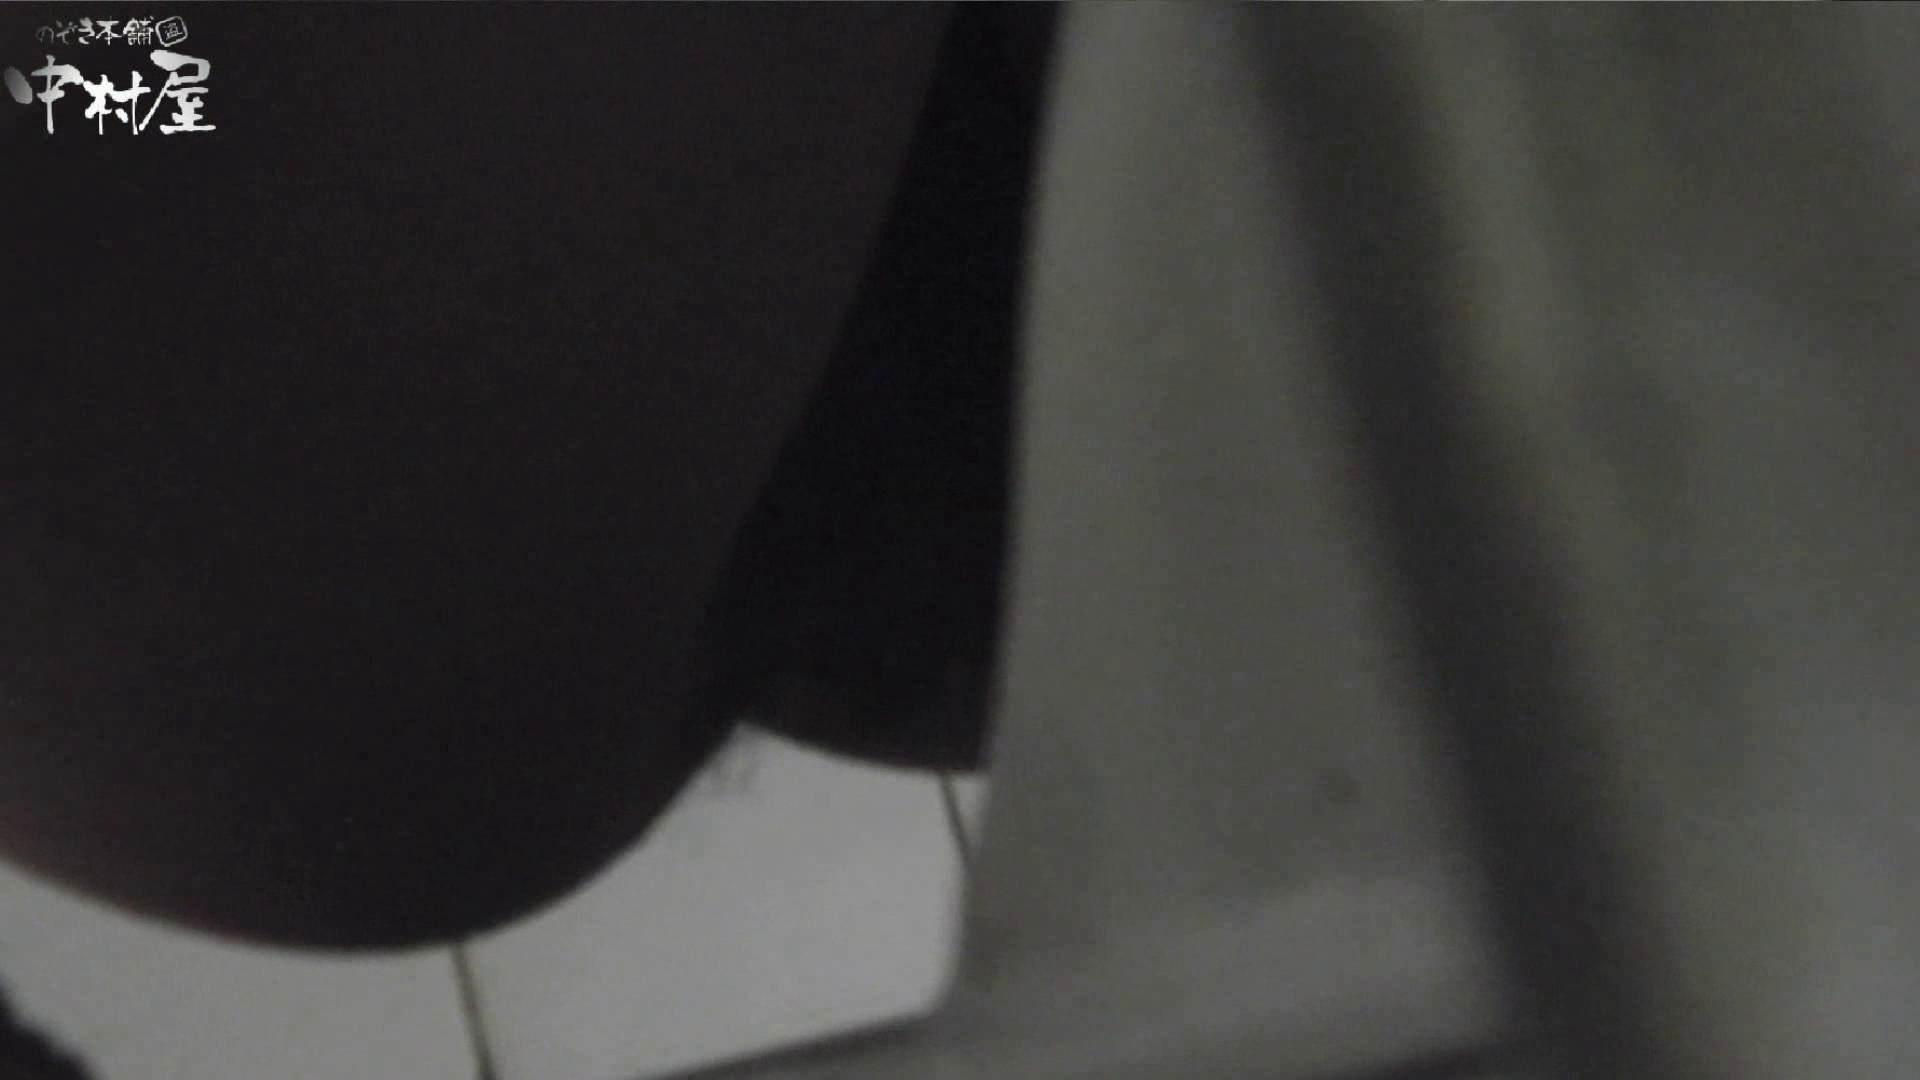 vol.42 命がけ潜伏洗面所! カカト上げながら・硬度強(太)・180g 洗面所 盗撮エロ画像 102画像 54